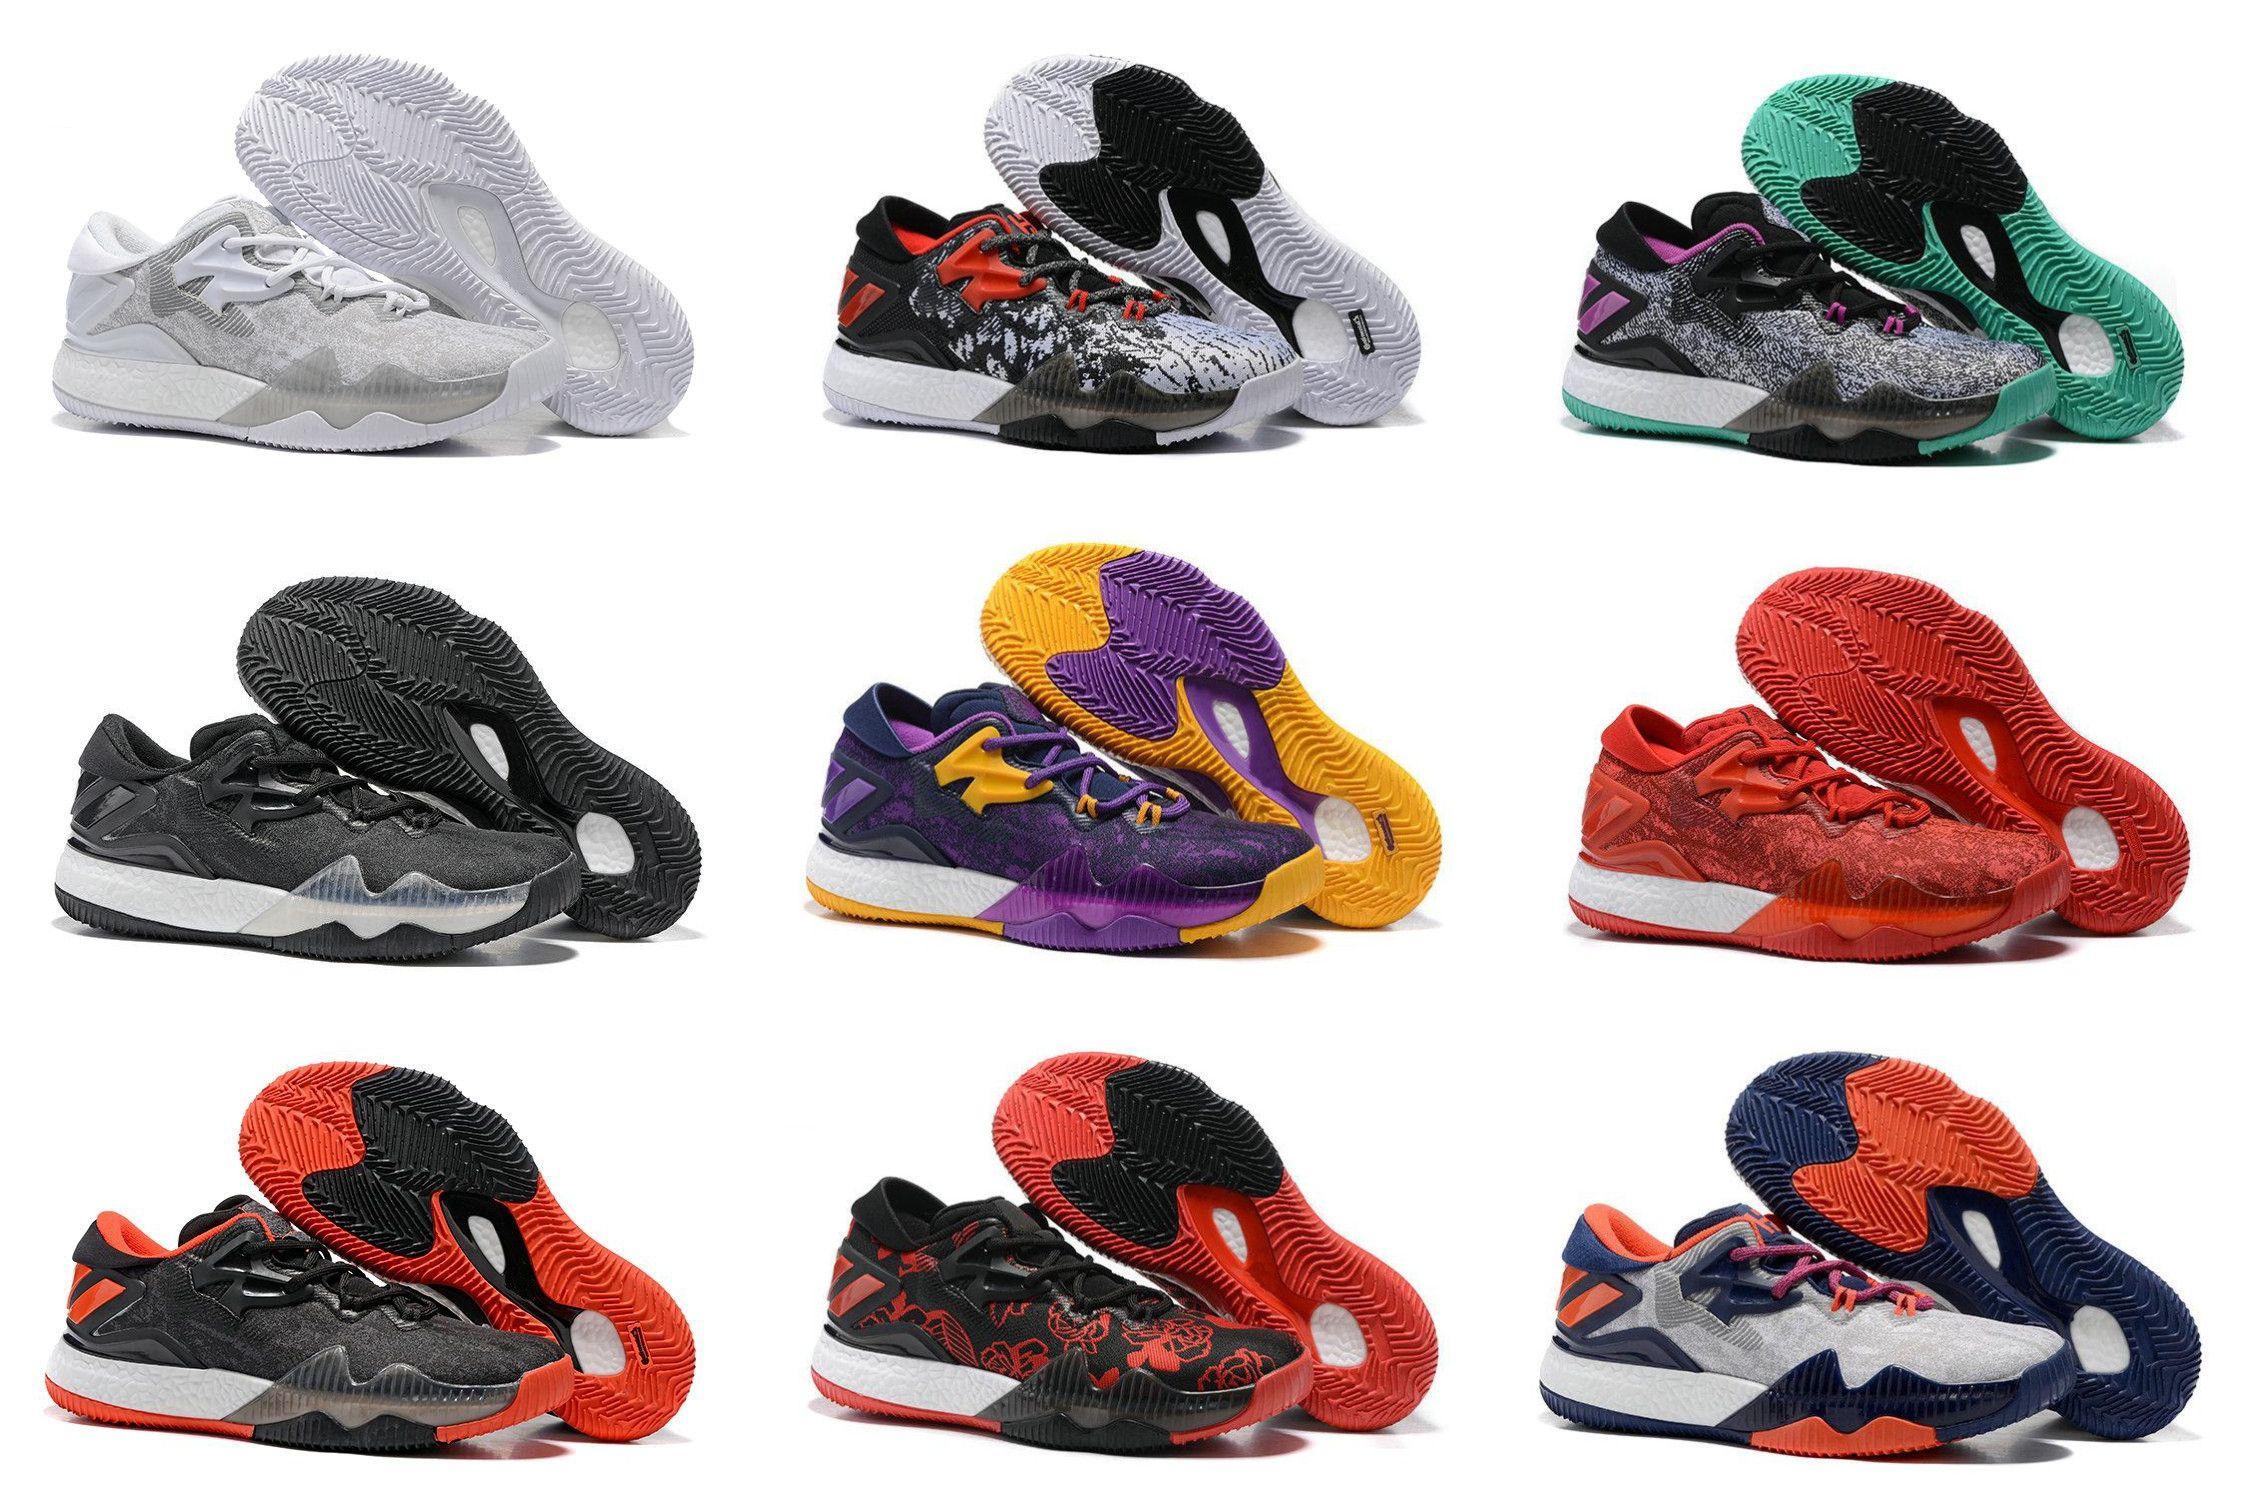 41977a8421bd 2017 Crazylight Boost Low Hot Basketball Shoes James Harden Boots Cheap  Basketball Sports Shoes Men Sneakers Shoes Sports Shorts Shoe Shop From  Jerseystore